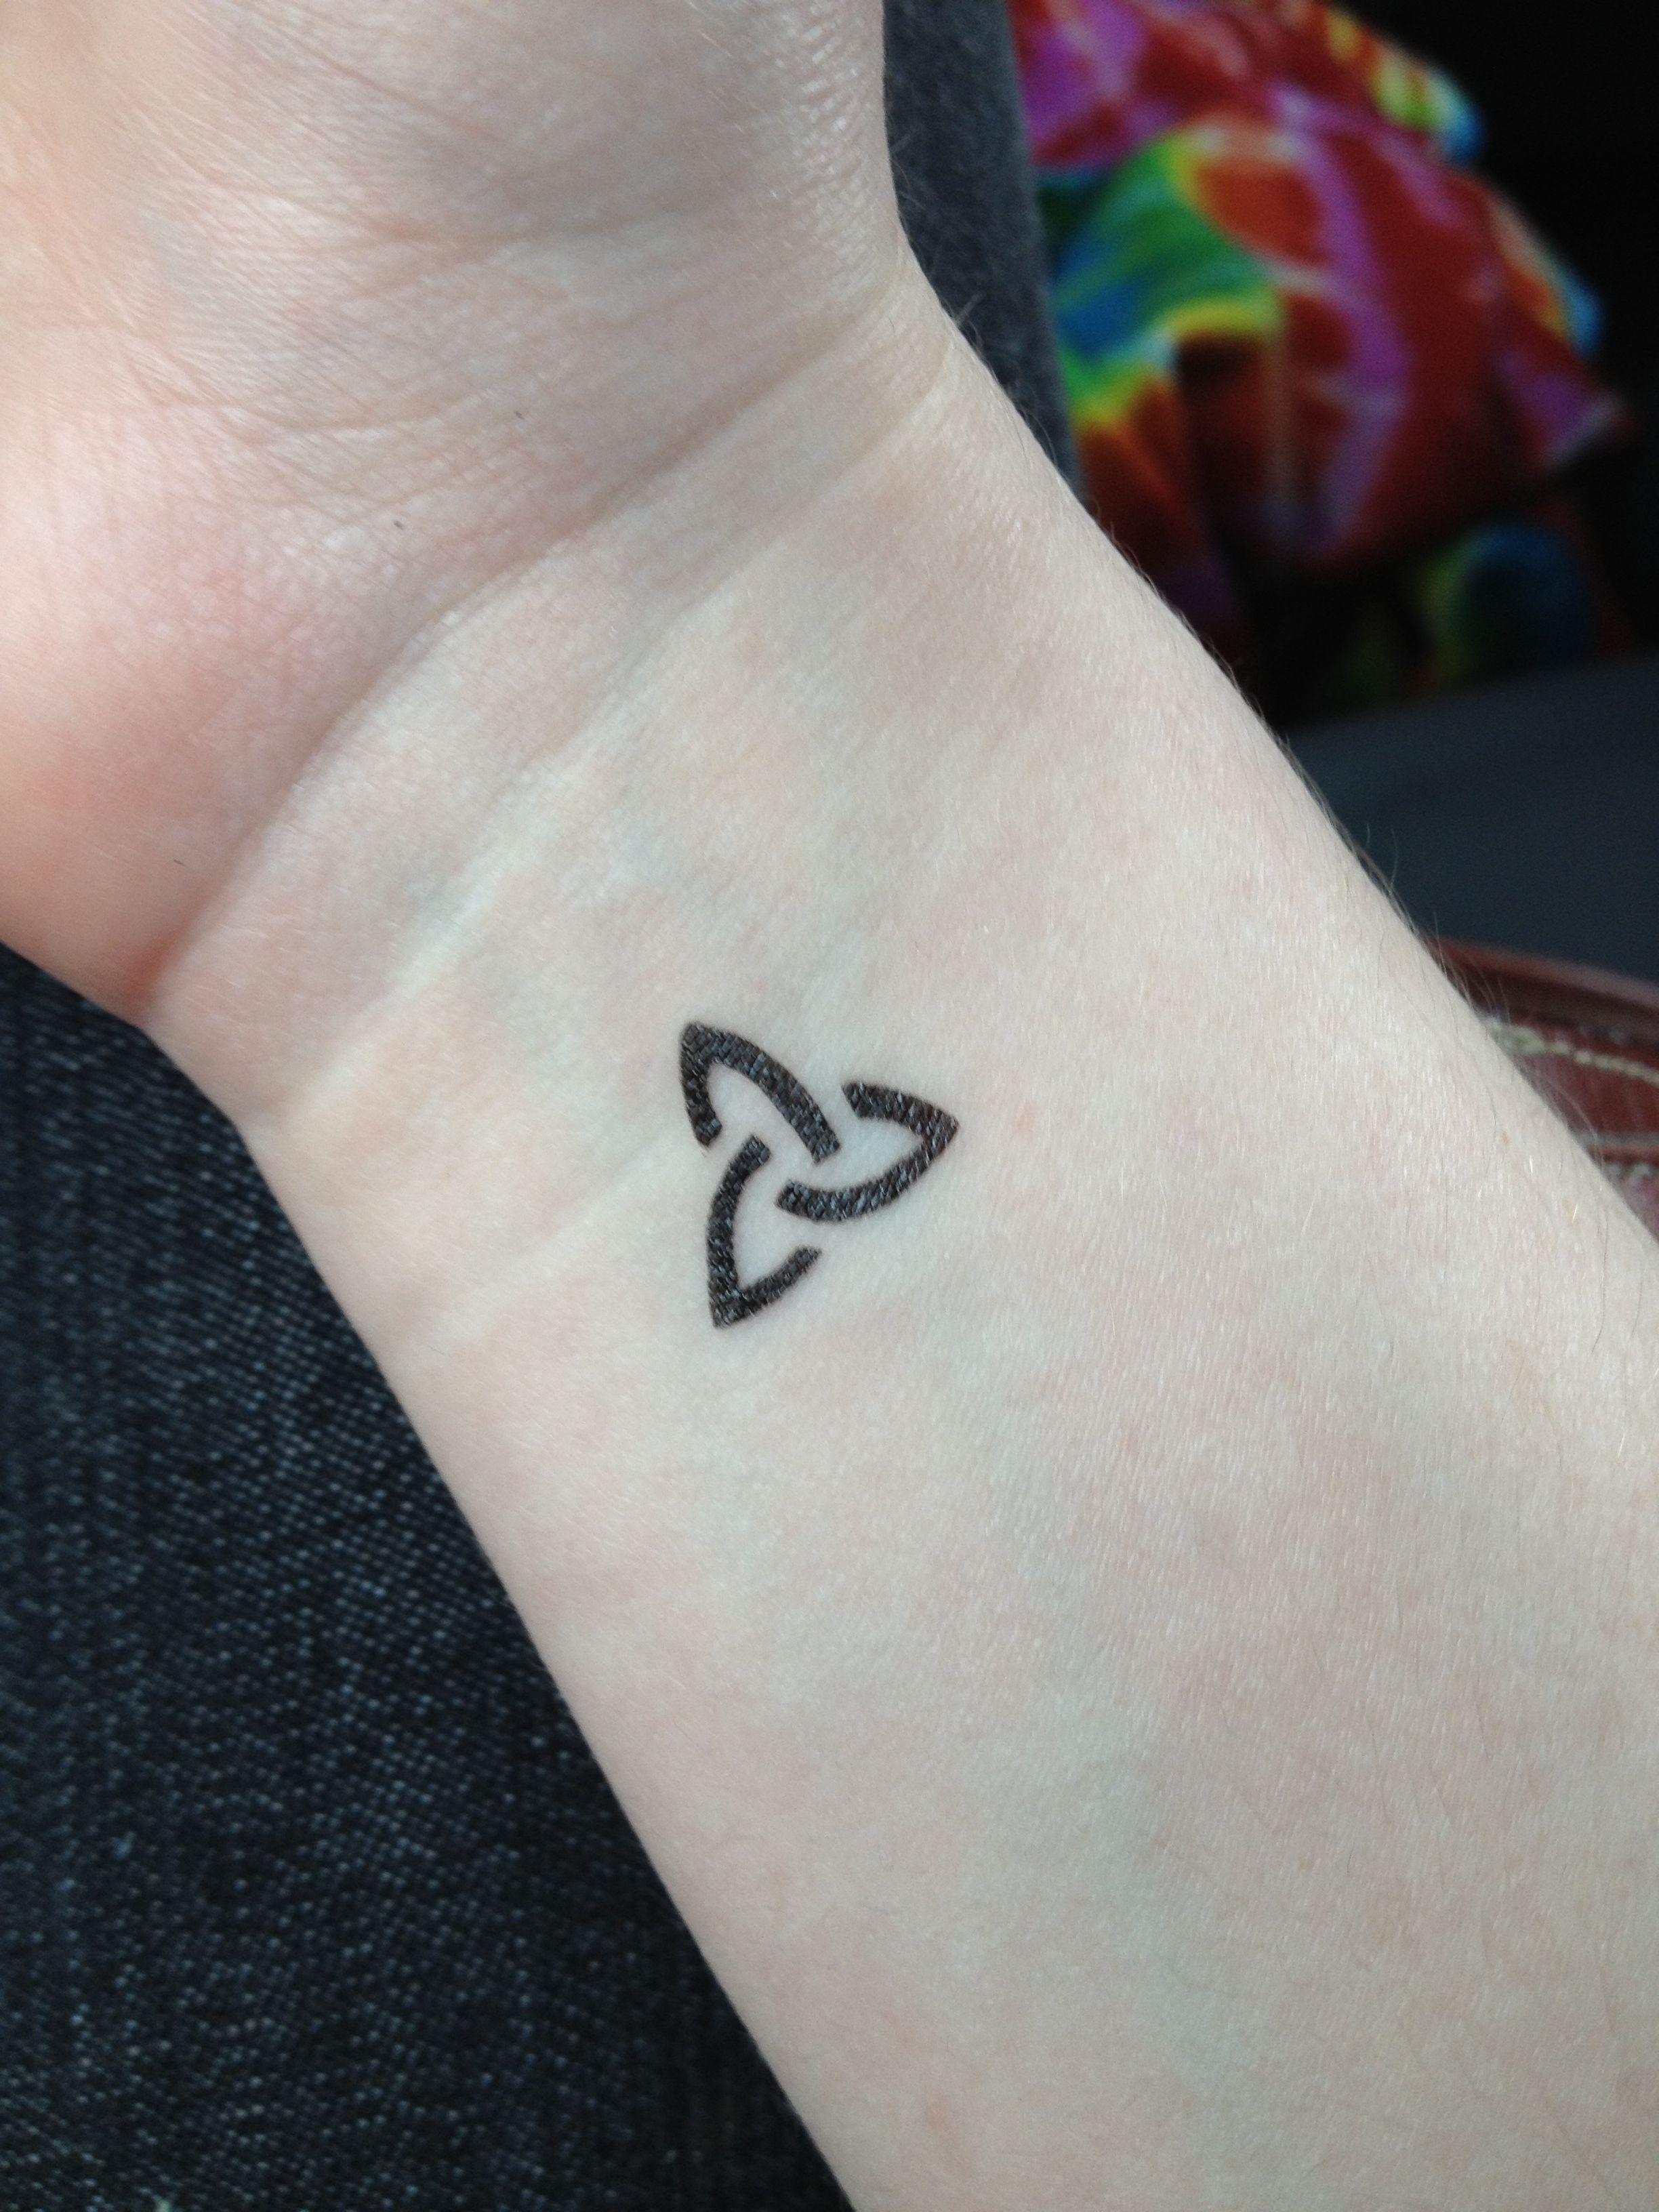 Inner Wrist Henna Tattoos: My Inner Wrist Celtic Knot Henna Tatto